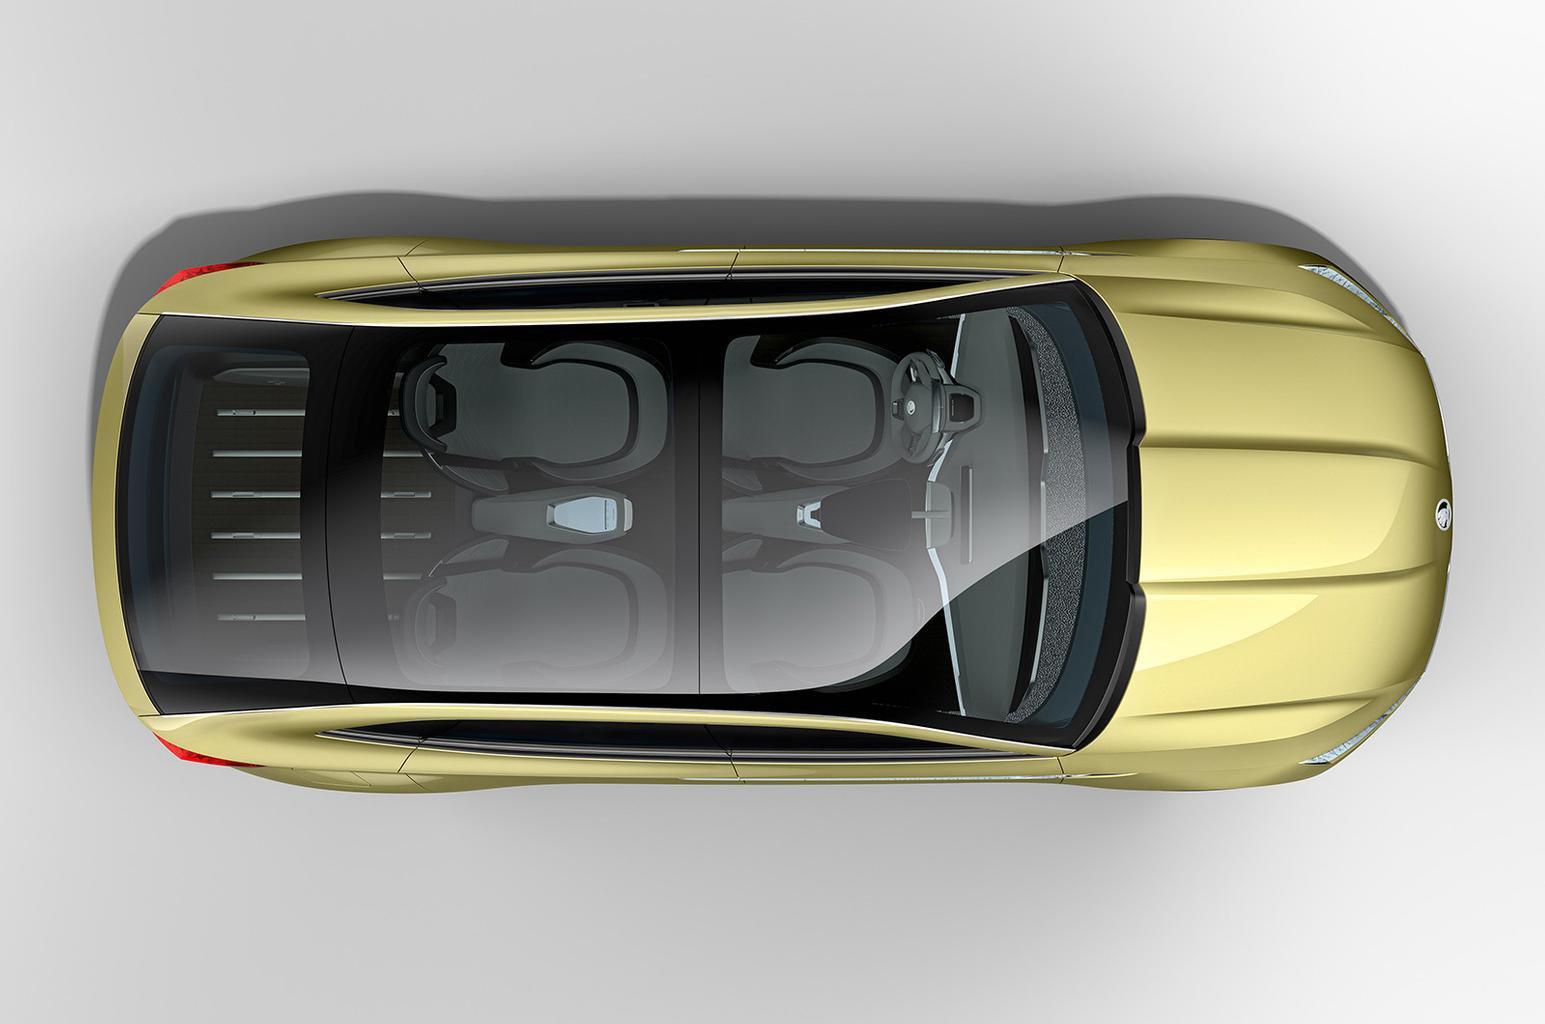 New Skoda Vision E concept previews electric SUV